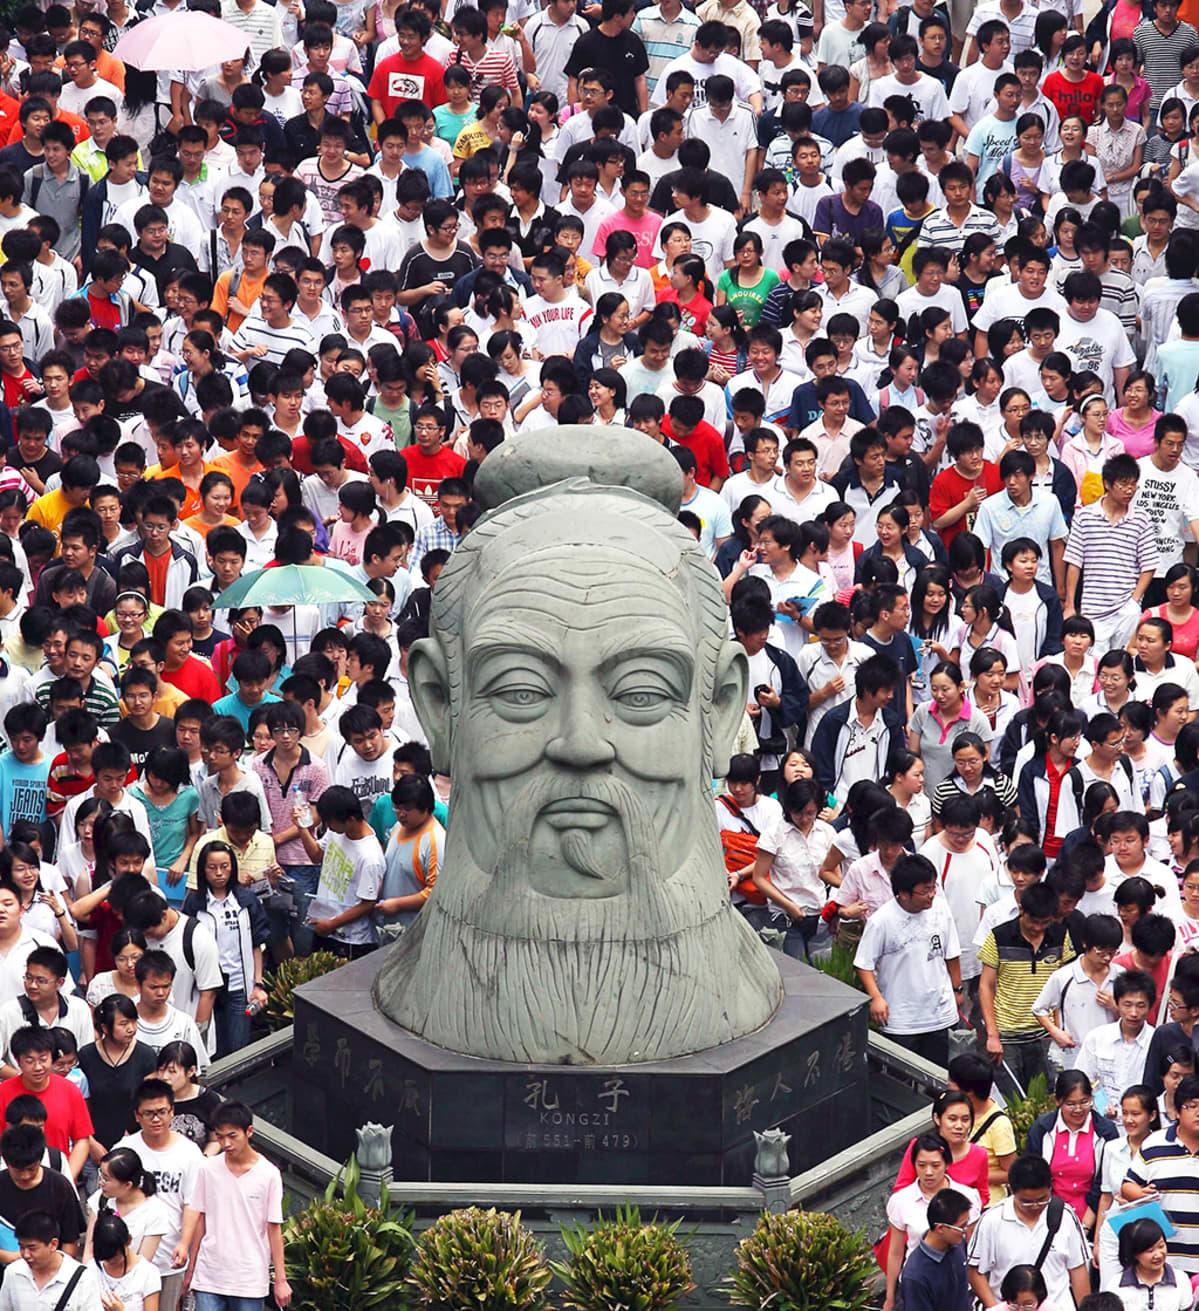 Kungfutselaisuus